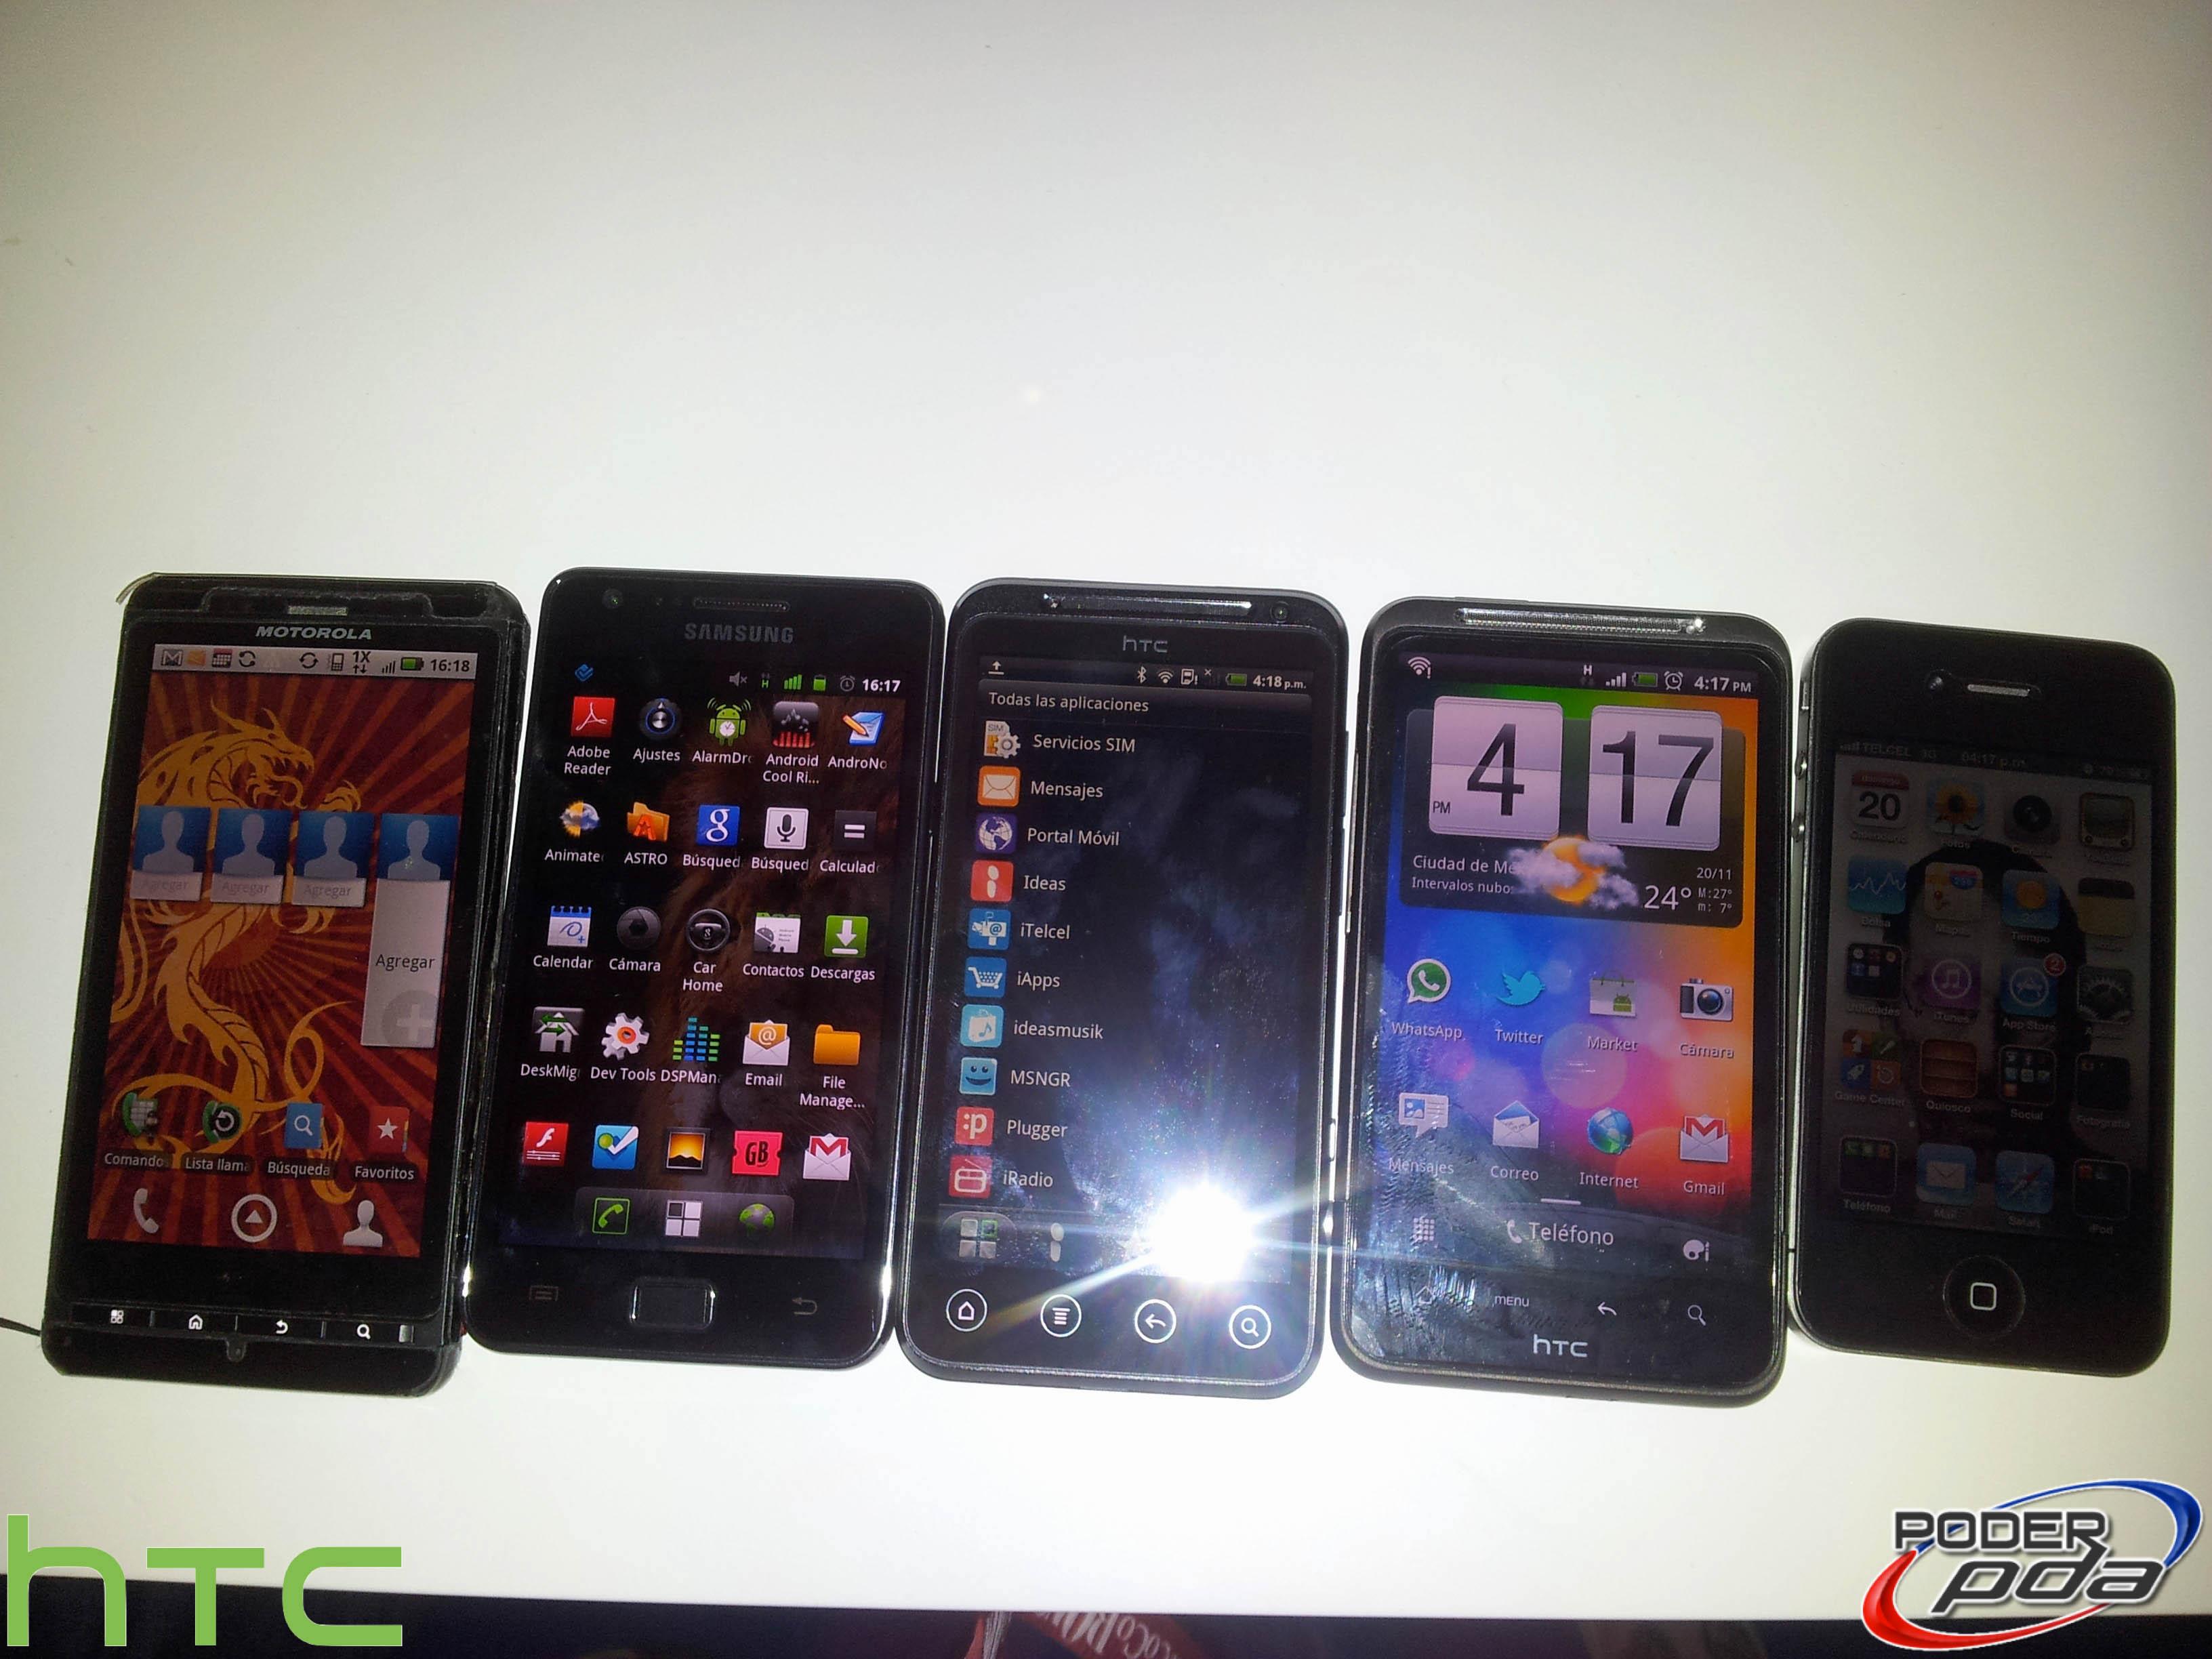 HTC-Inspire-3D-en-Mexico-ADMX3-13